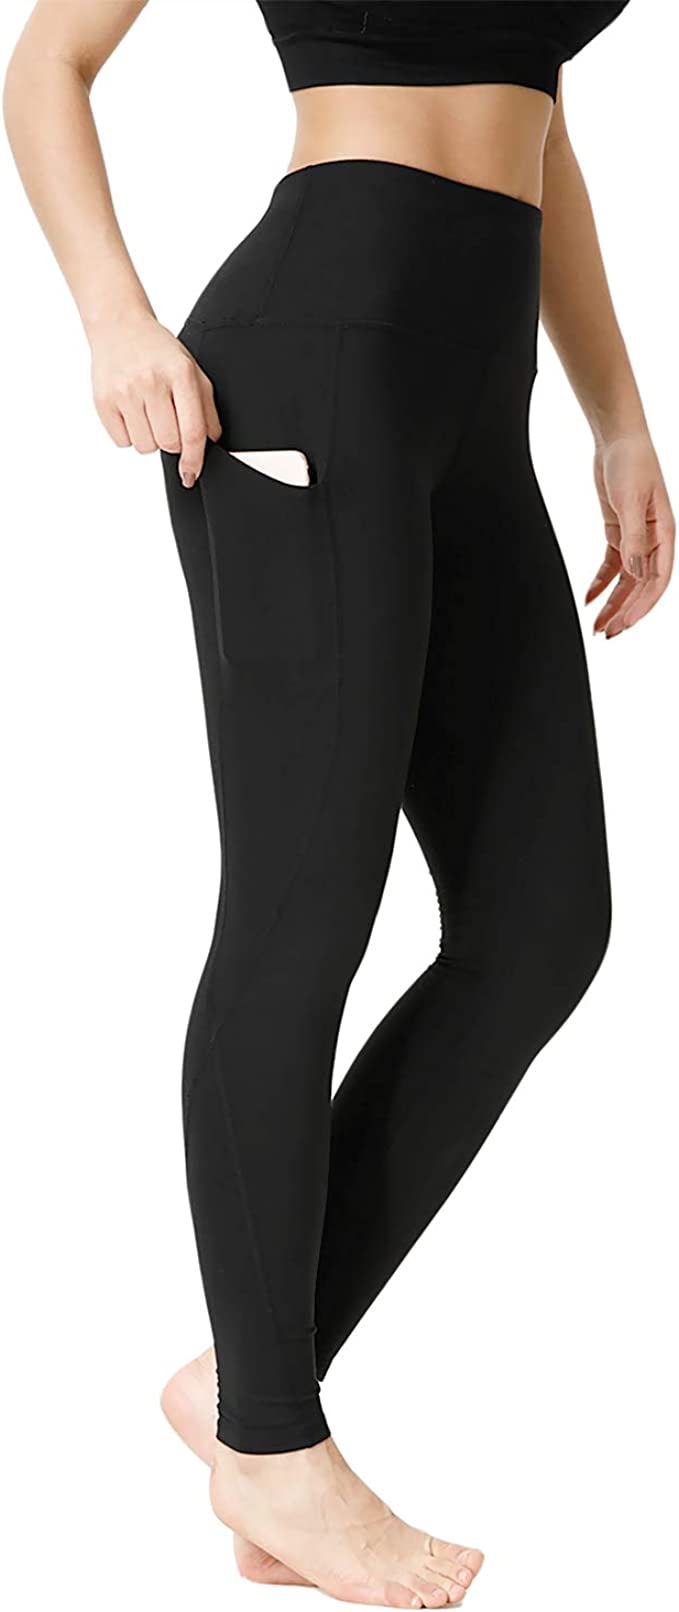 Amazon.com: CLOZZ.U - Pantalones de yoga de cintura alta con ...